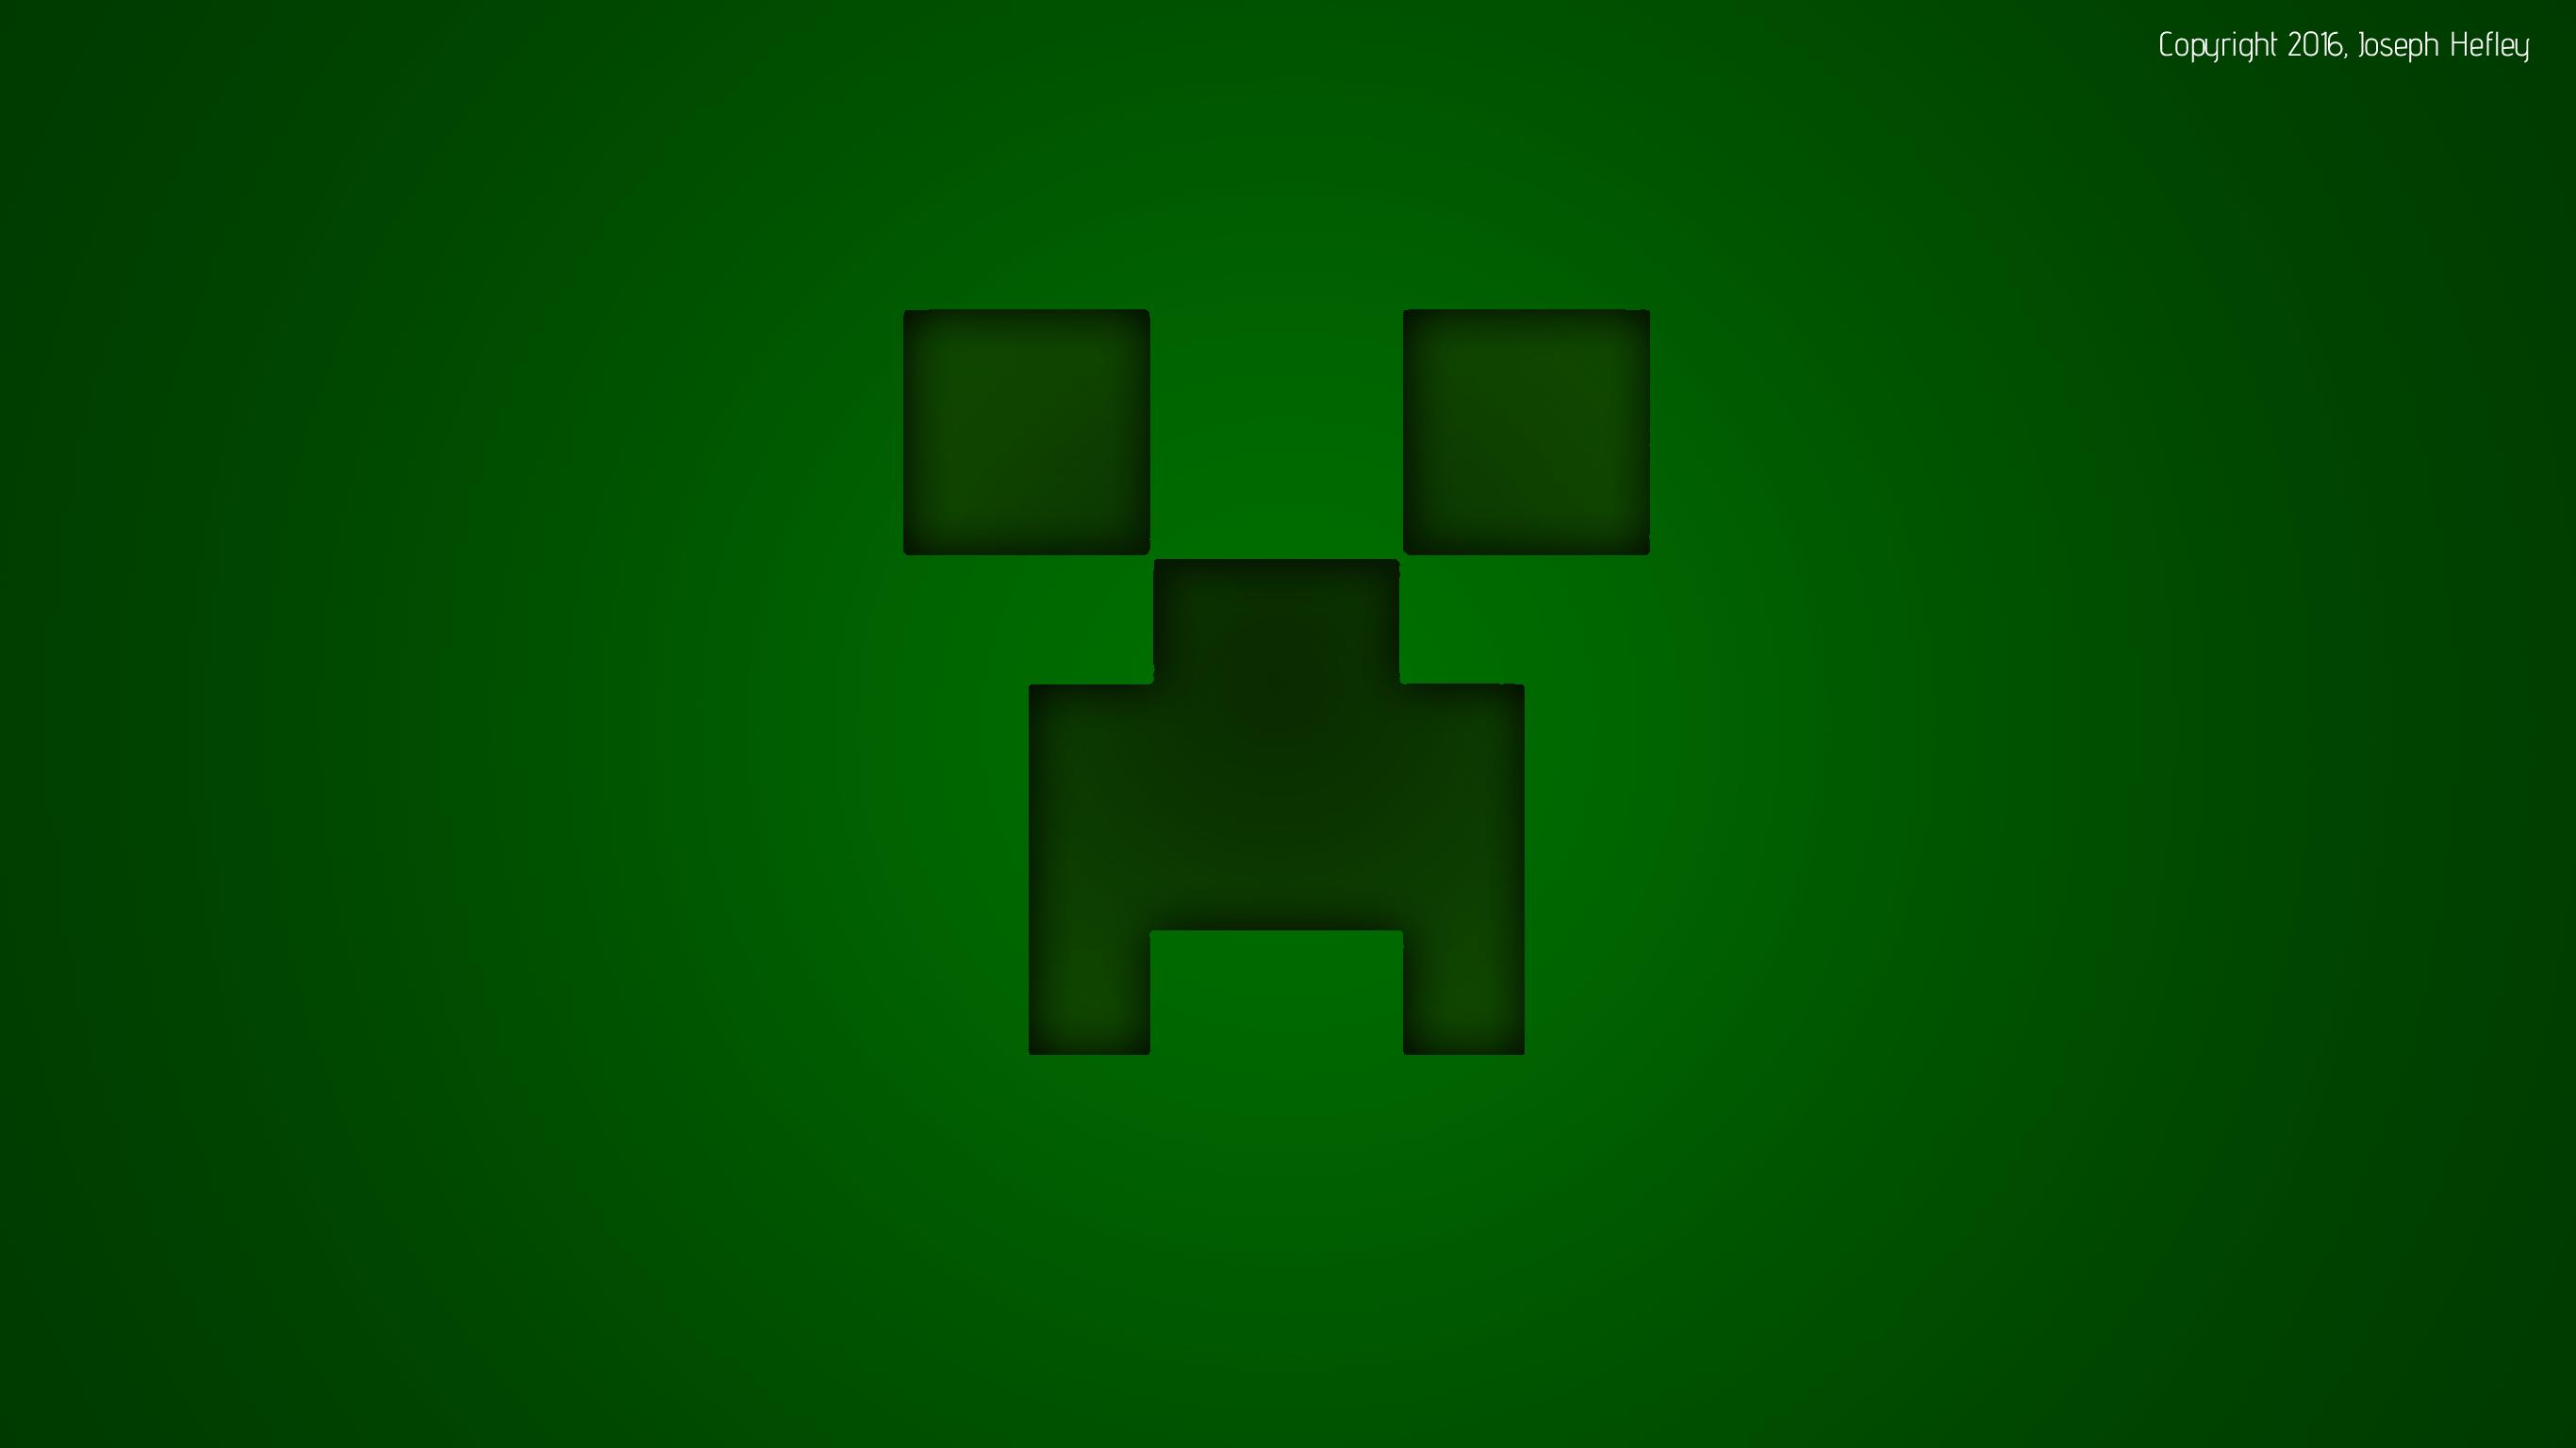 ... Minecraft Creeper Wallpaper (2K SuperHD) by JoeTPB